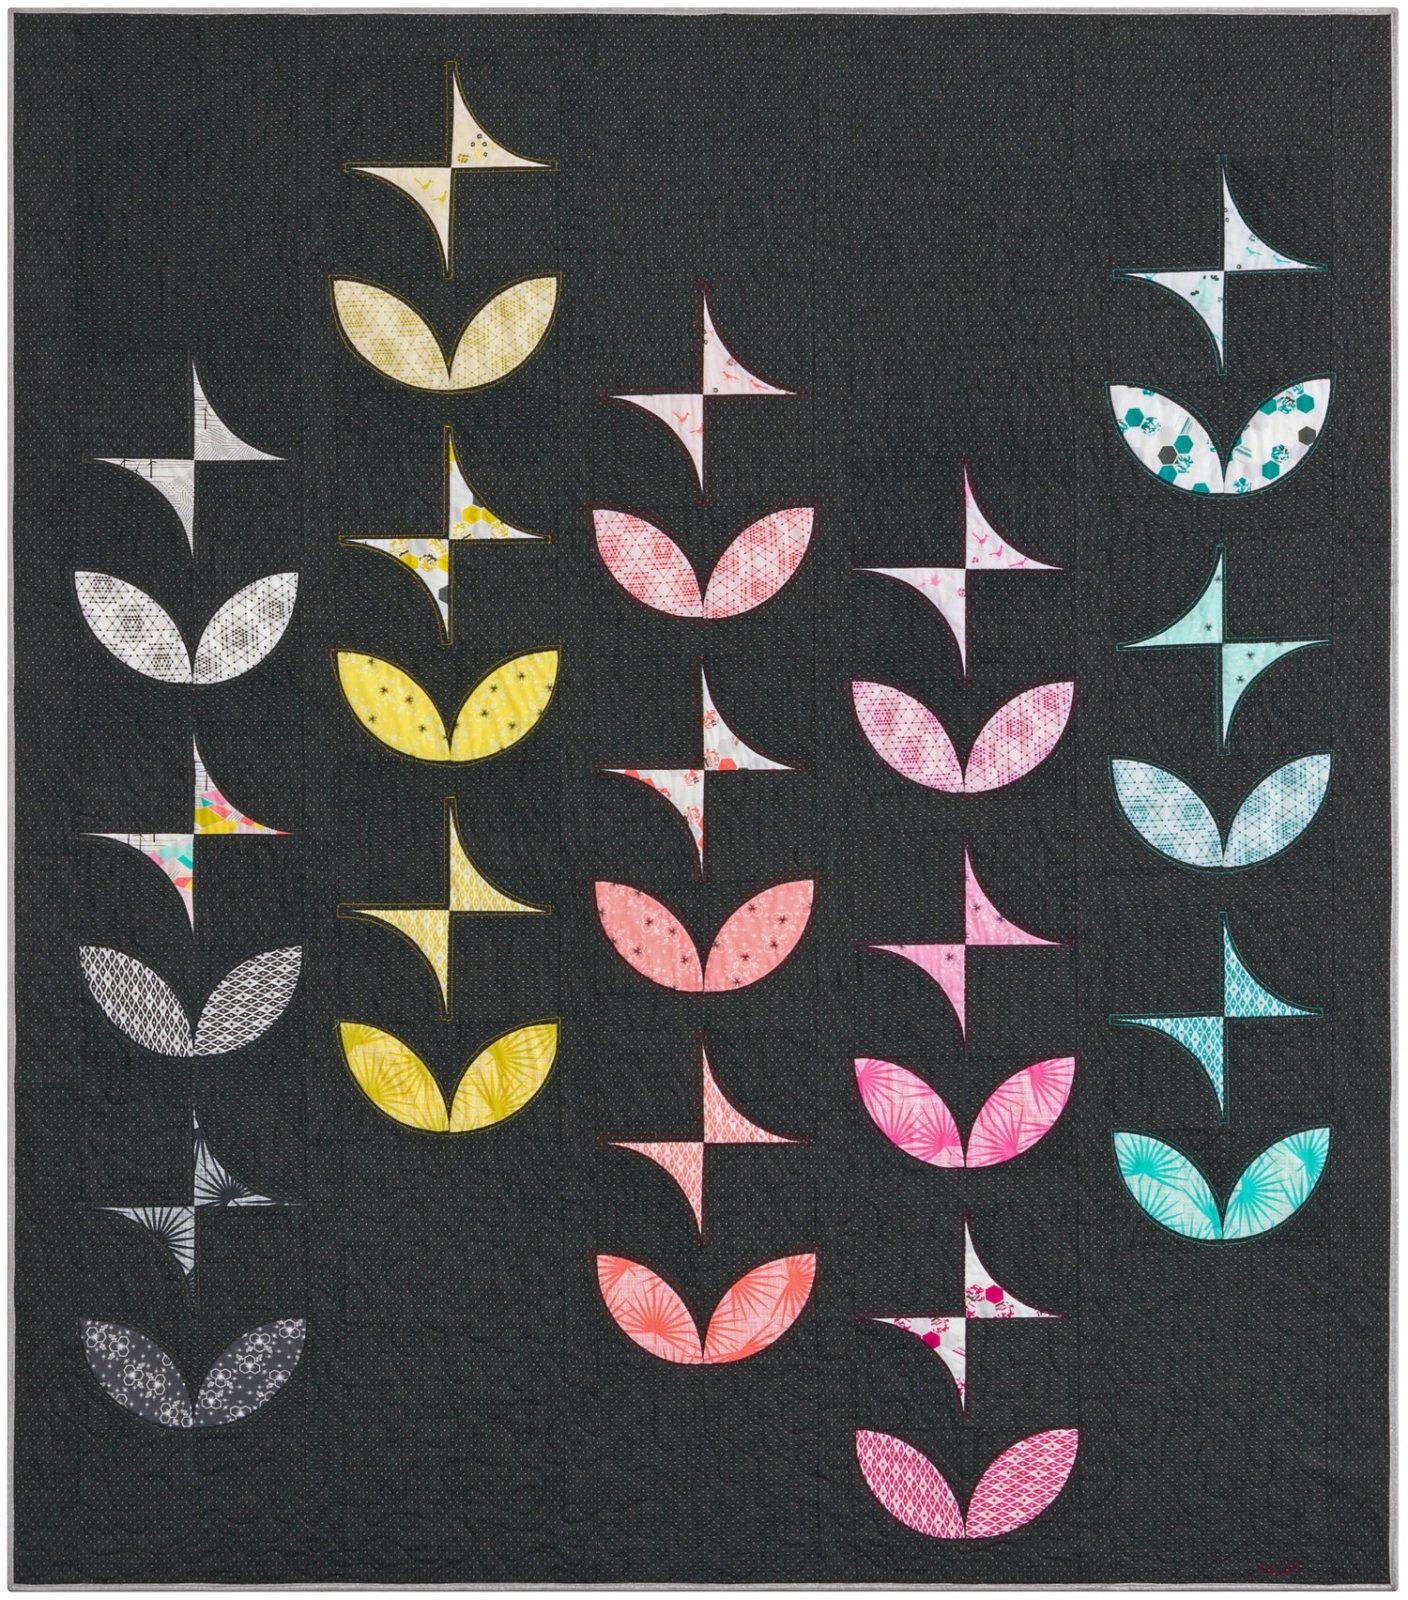 Violet Craft  - The Orange Peels + Pinwheels quilt